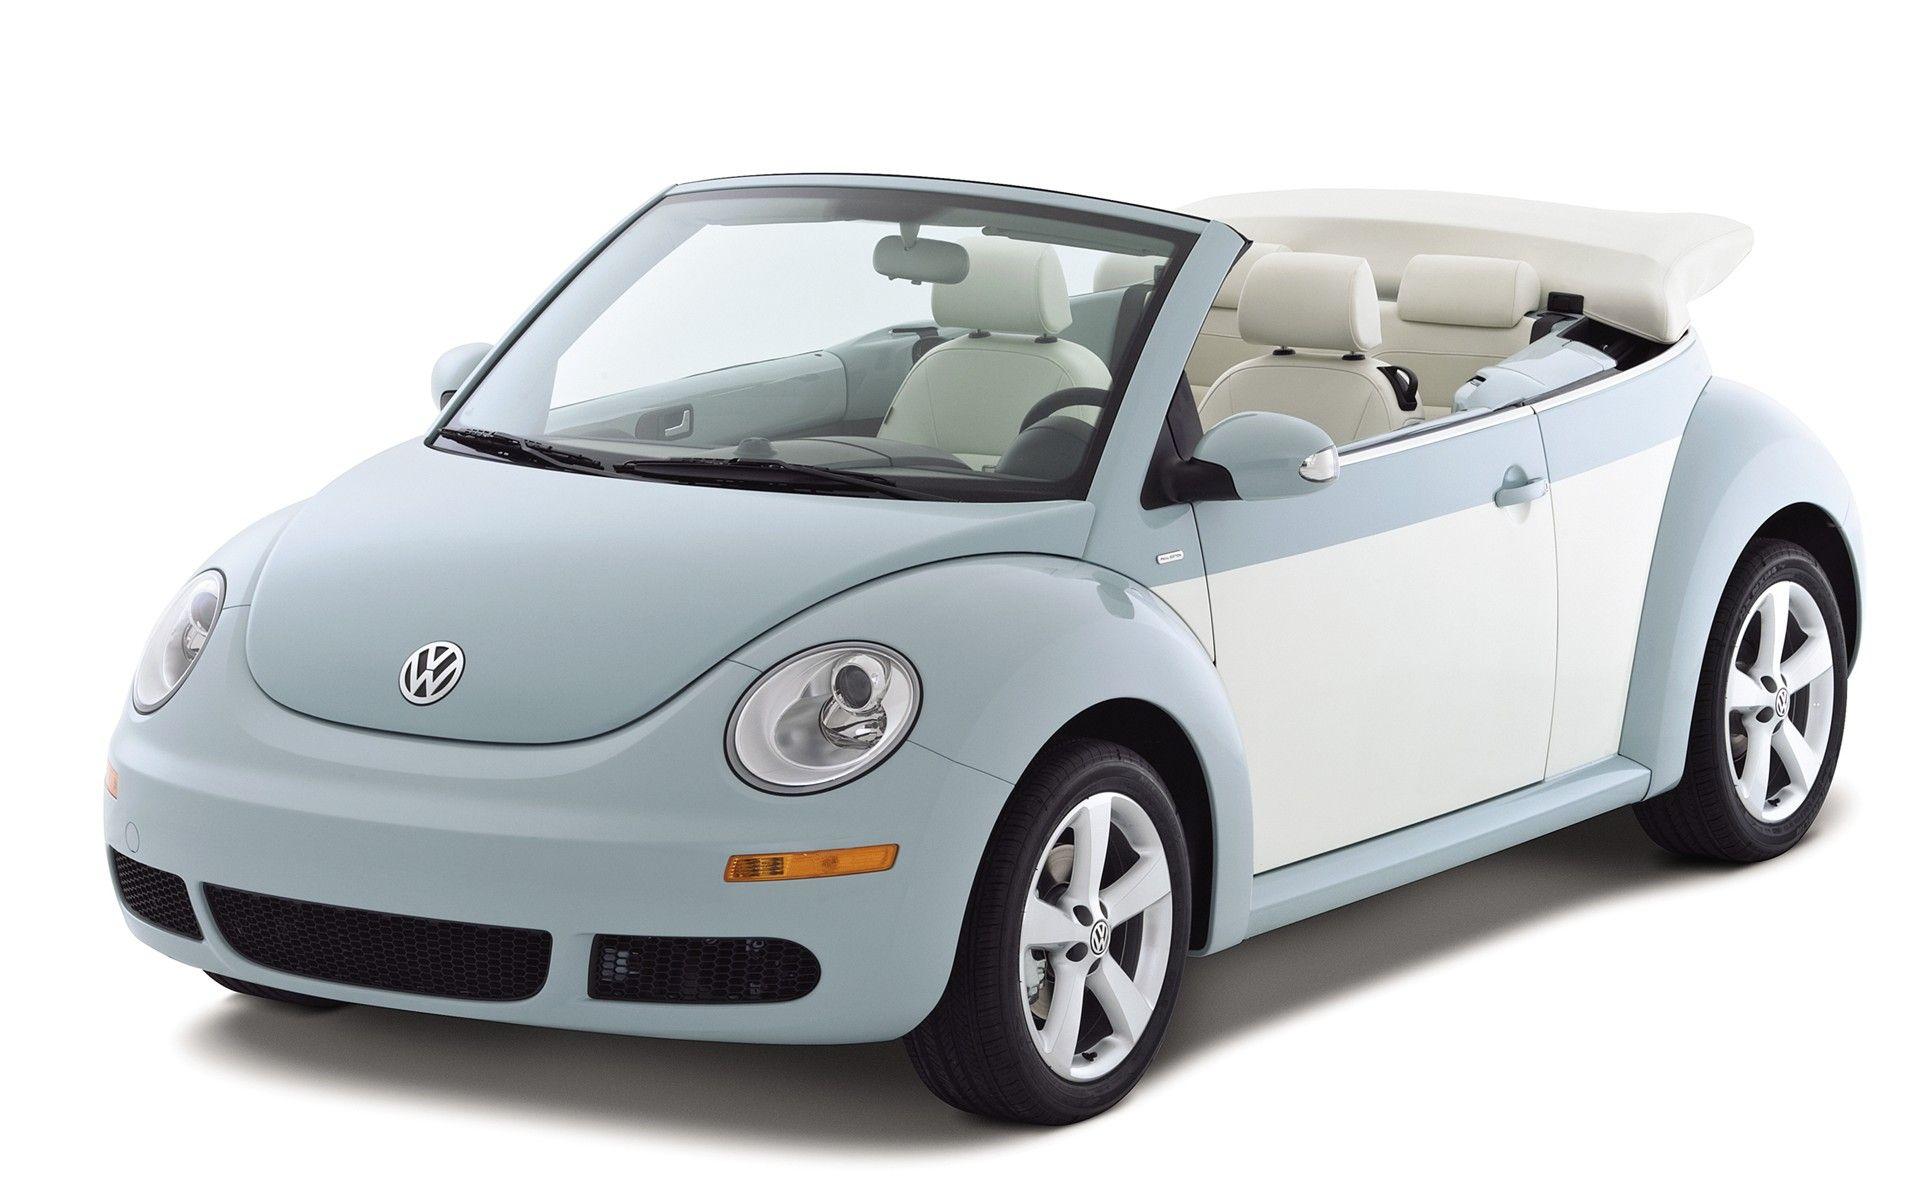 2014 Volkswagen Microbus Illustrations hd wallpapers